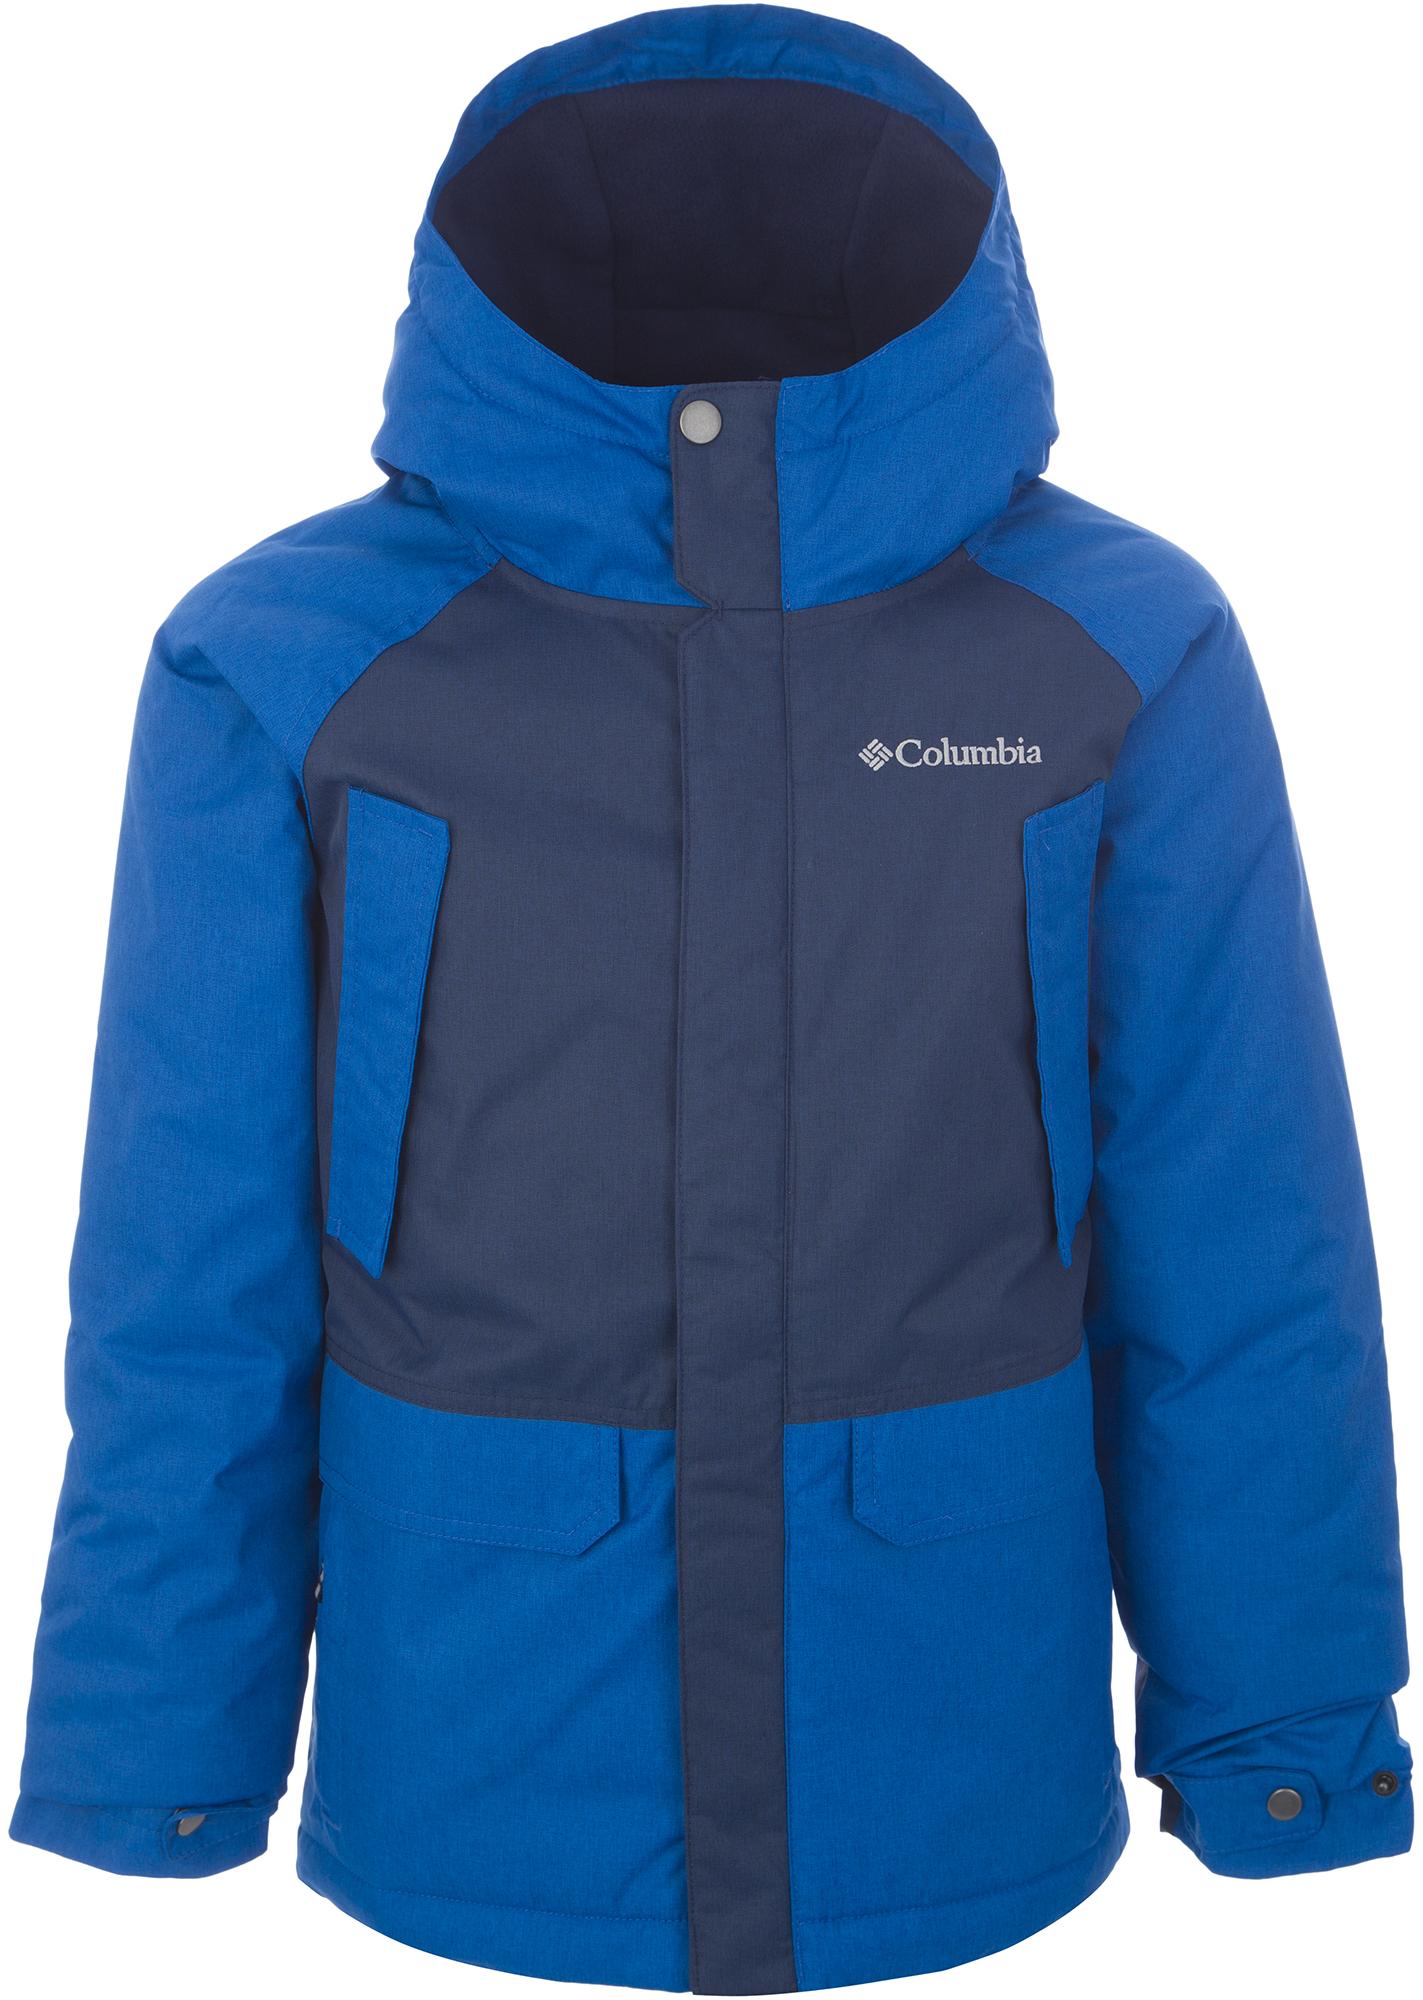 Columbia Куртка утепленная для мальчиков  Chesterbrook Insulated, размер 160-170